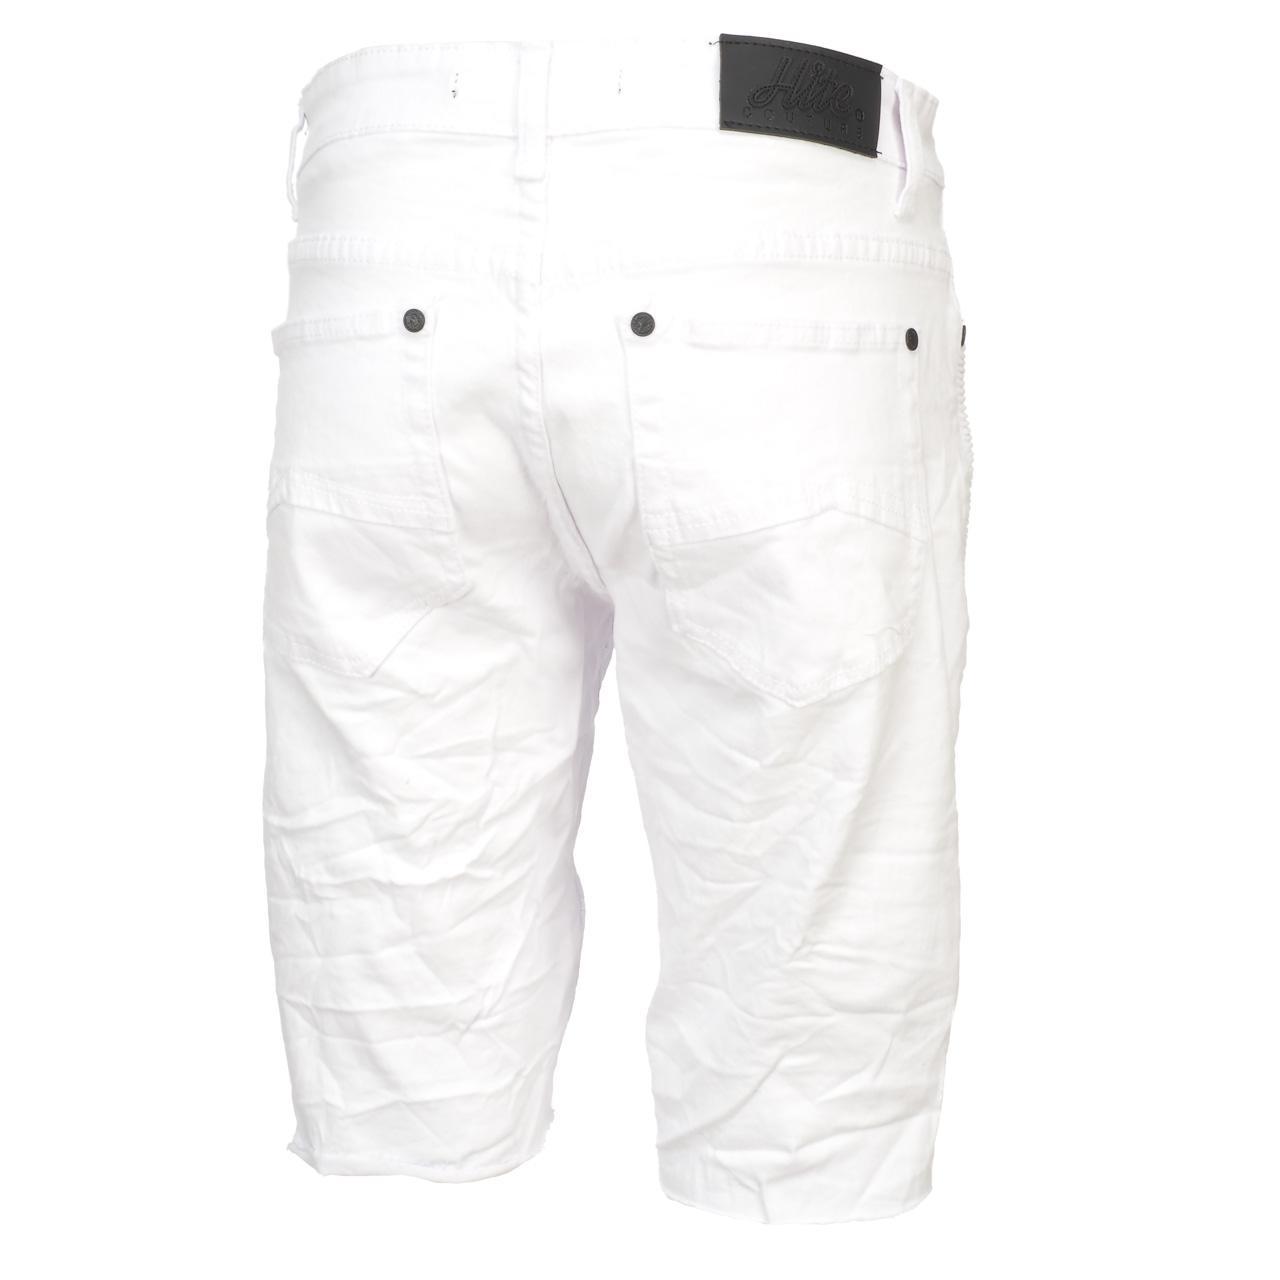 Bermuda-Shorts-Hite-Couture-Vibrate-White-Bermuda-White-11650-New thumbnail 5